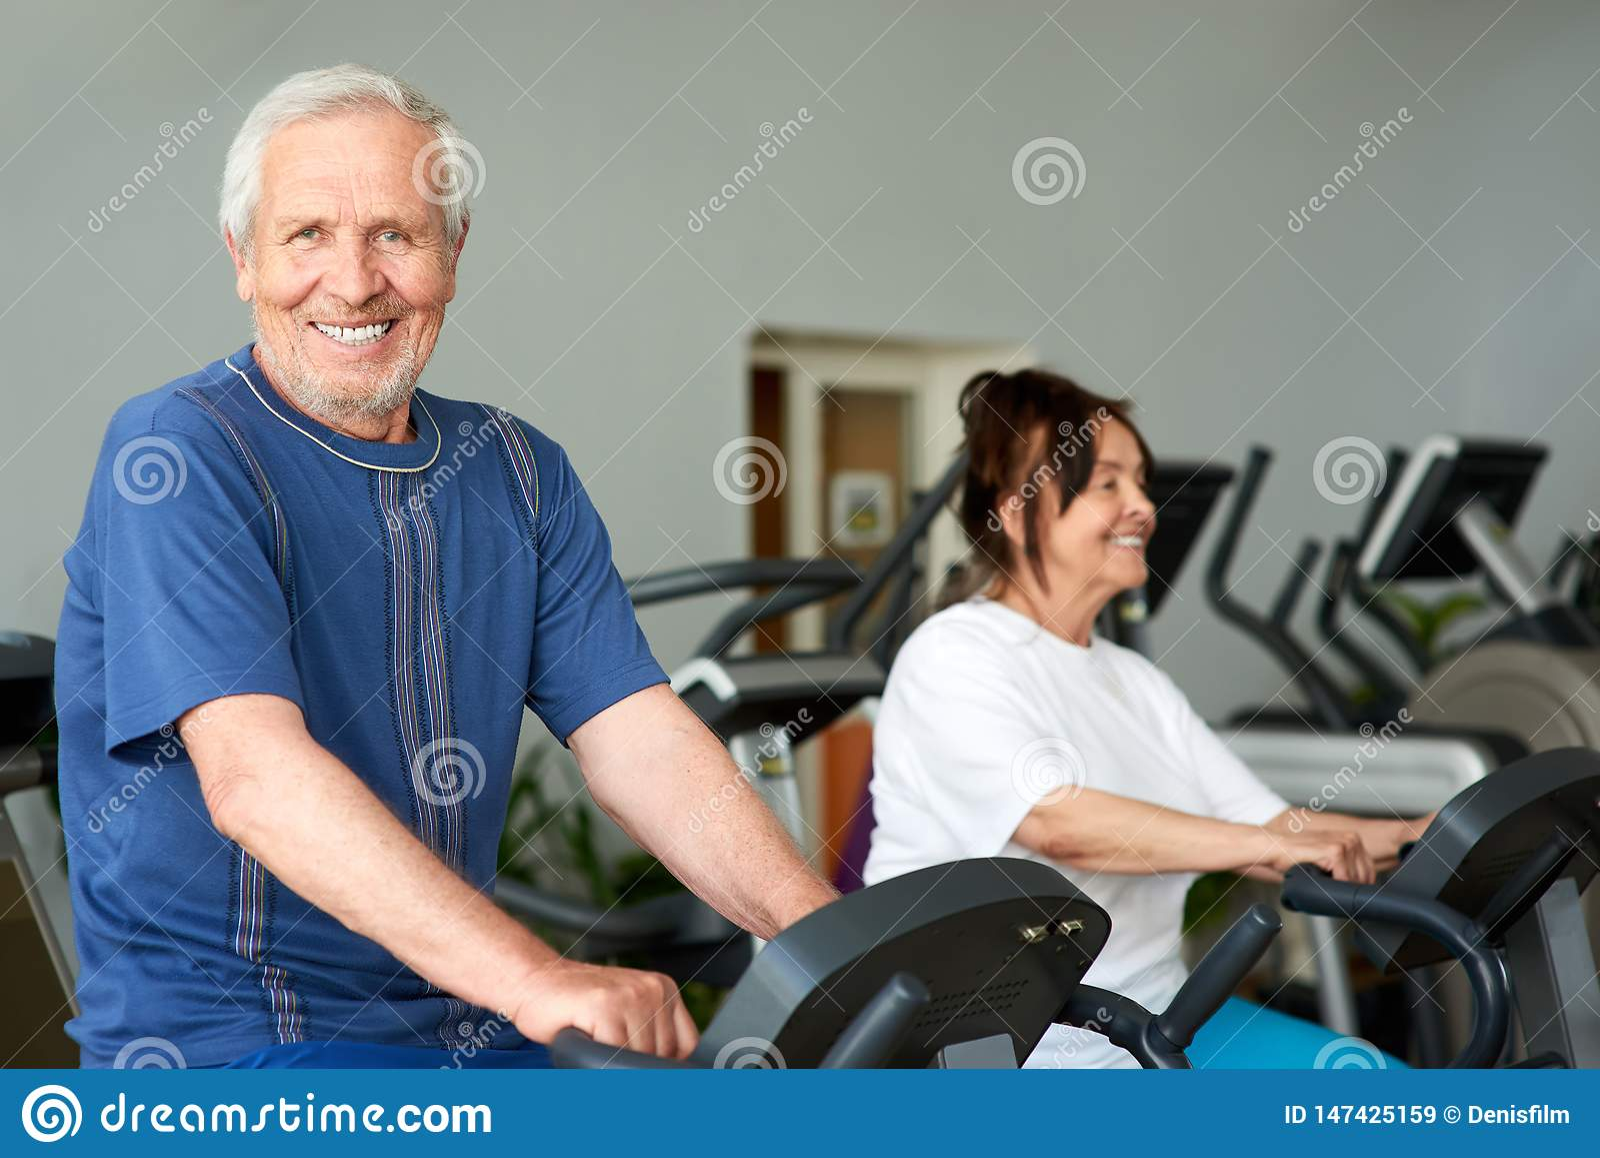 Gelukkig bejaarde die in gymnastiek uitwerken